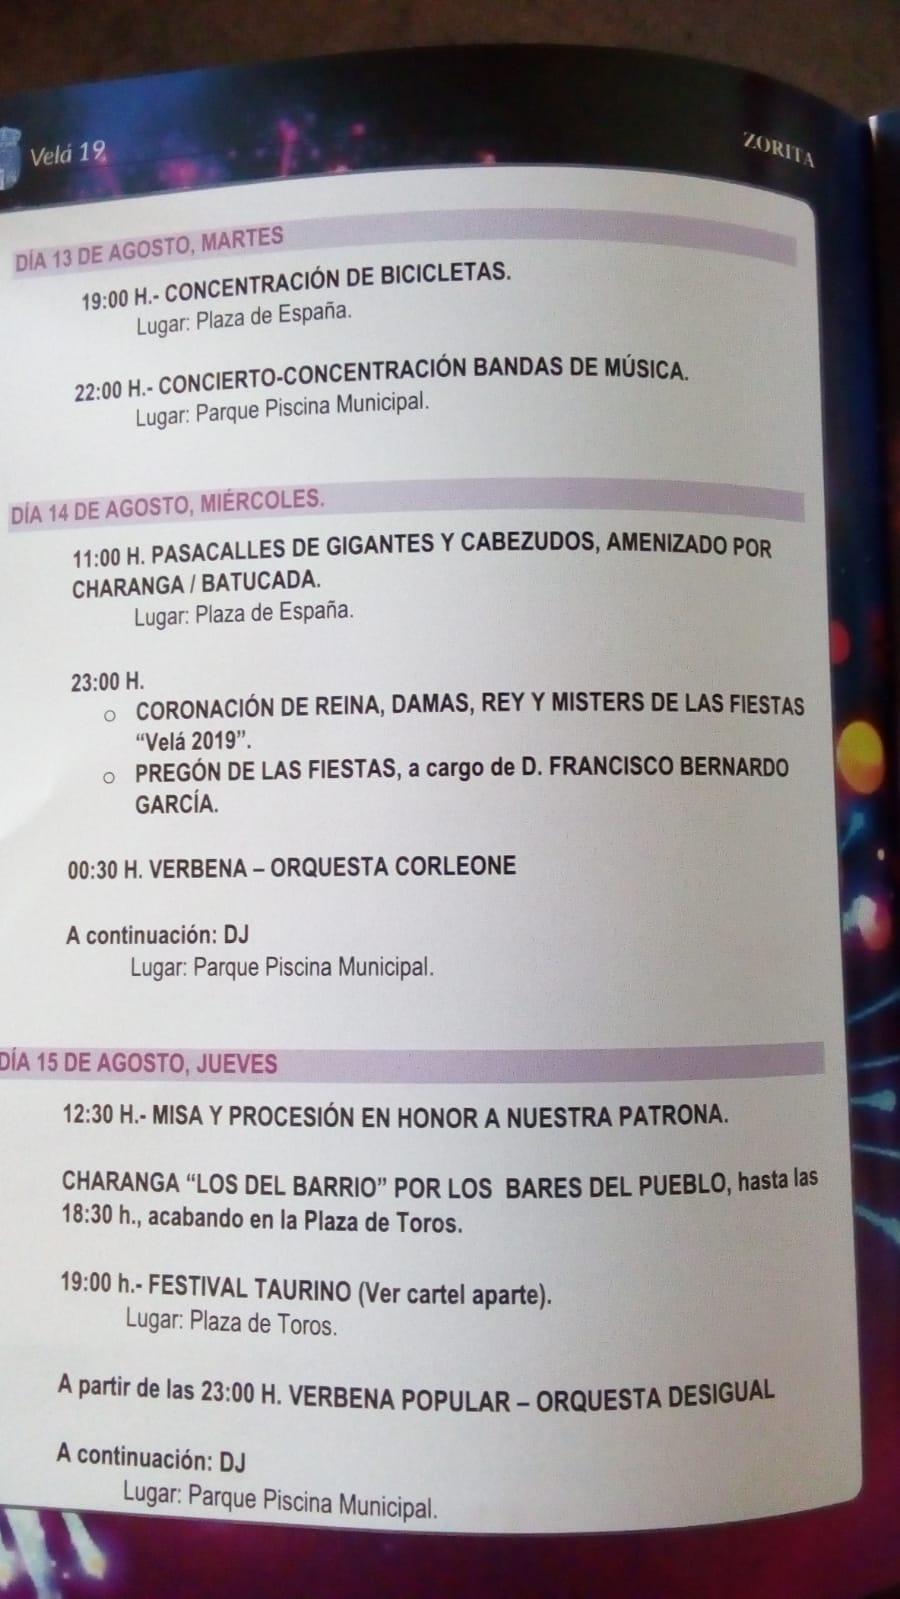 Programa Velá 2019 - Zorita (Cáceres) 3